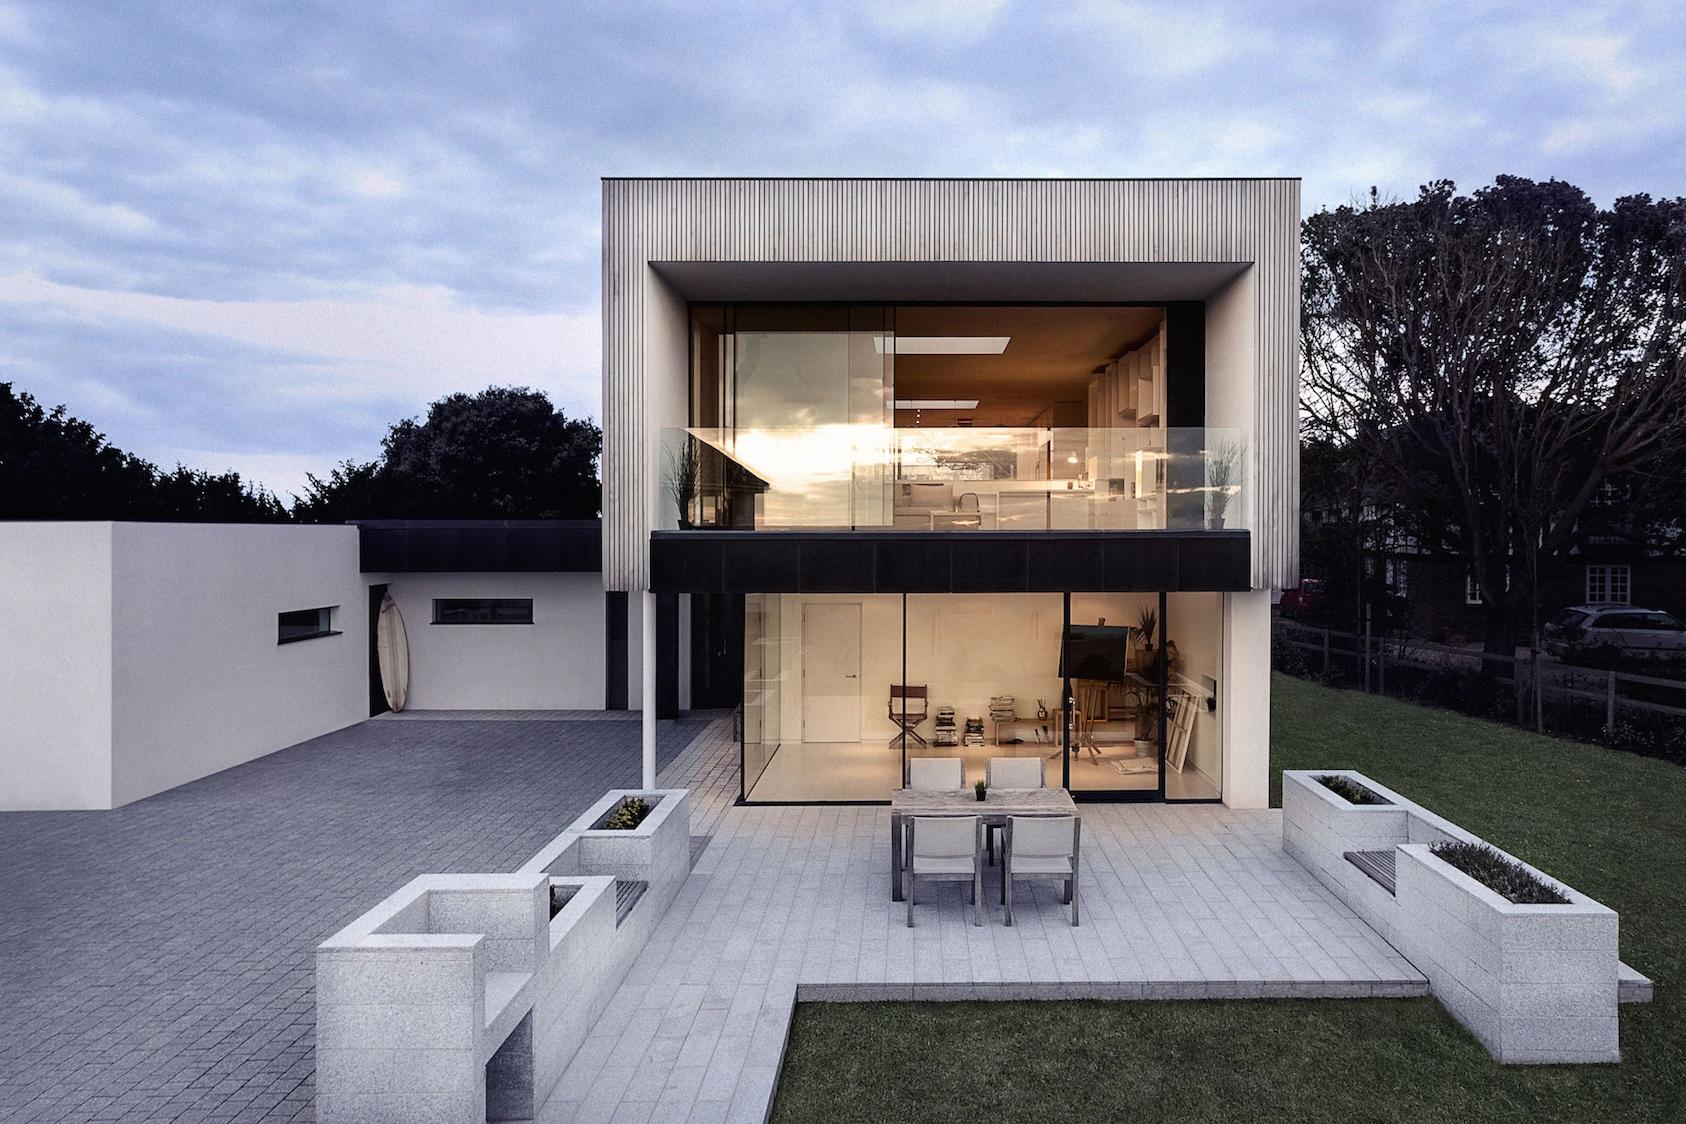 OBA_New-Build_Zinc-House_1.1.jpg